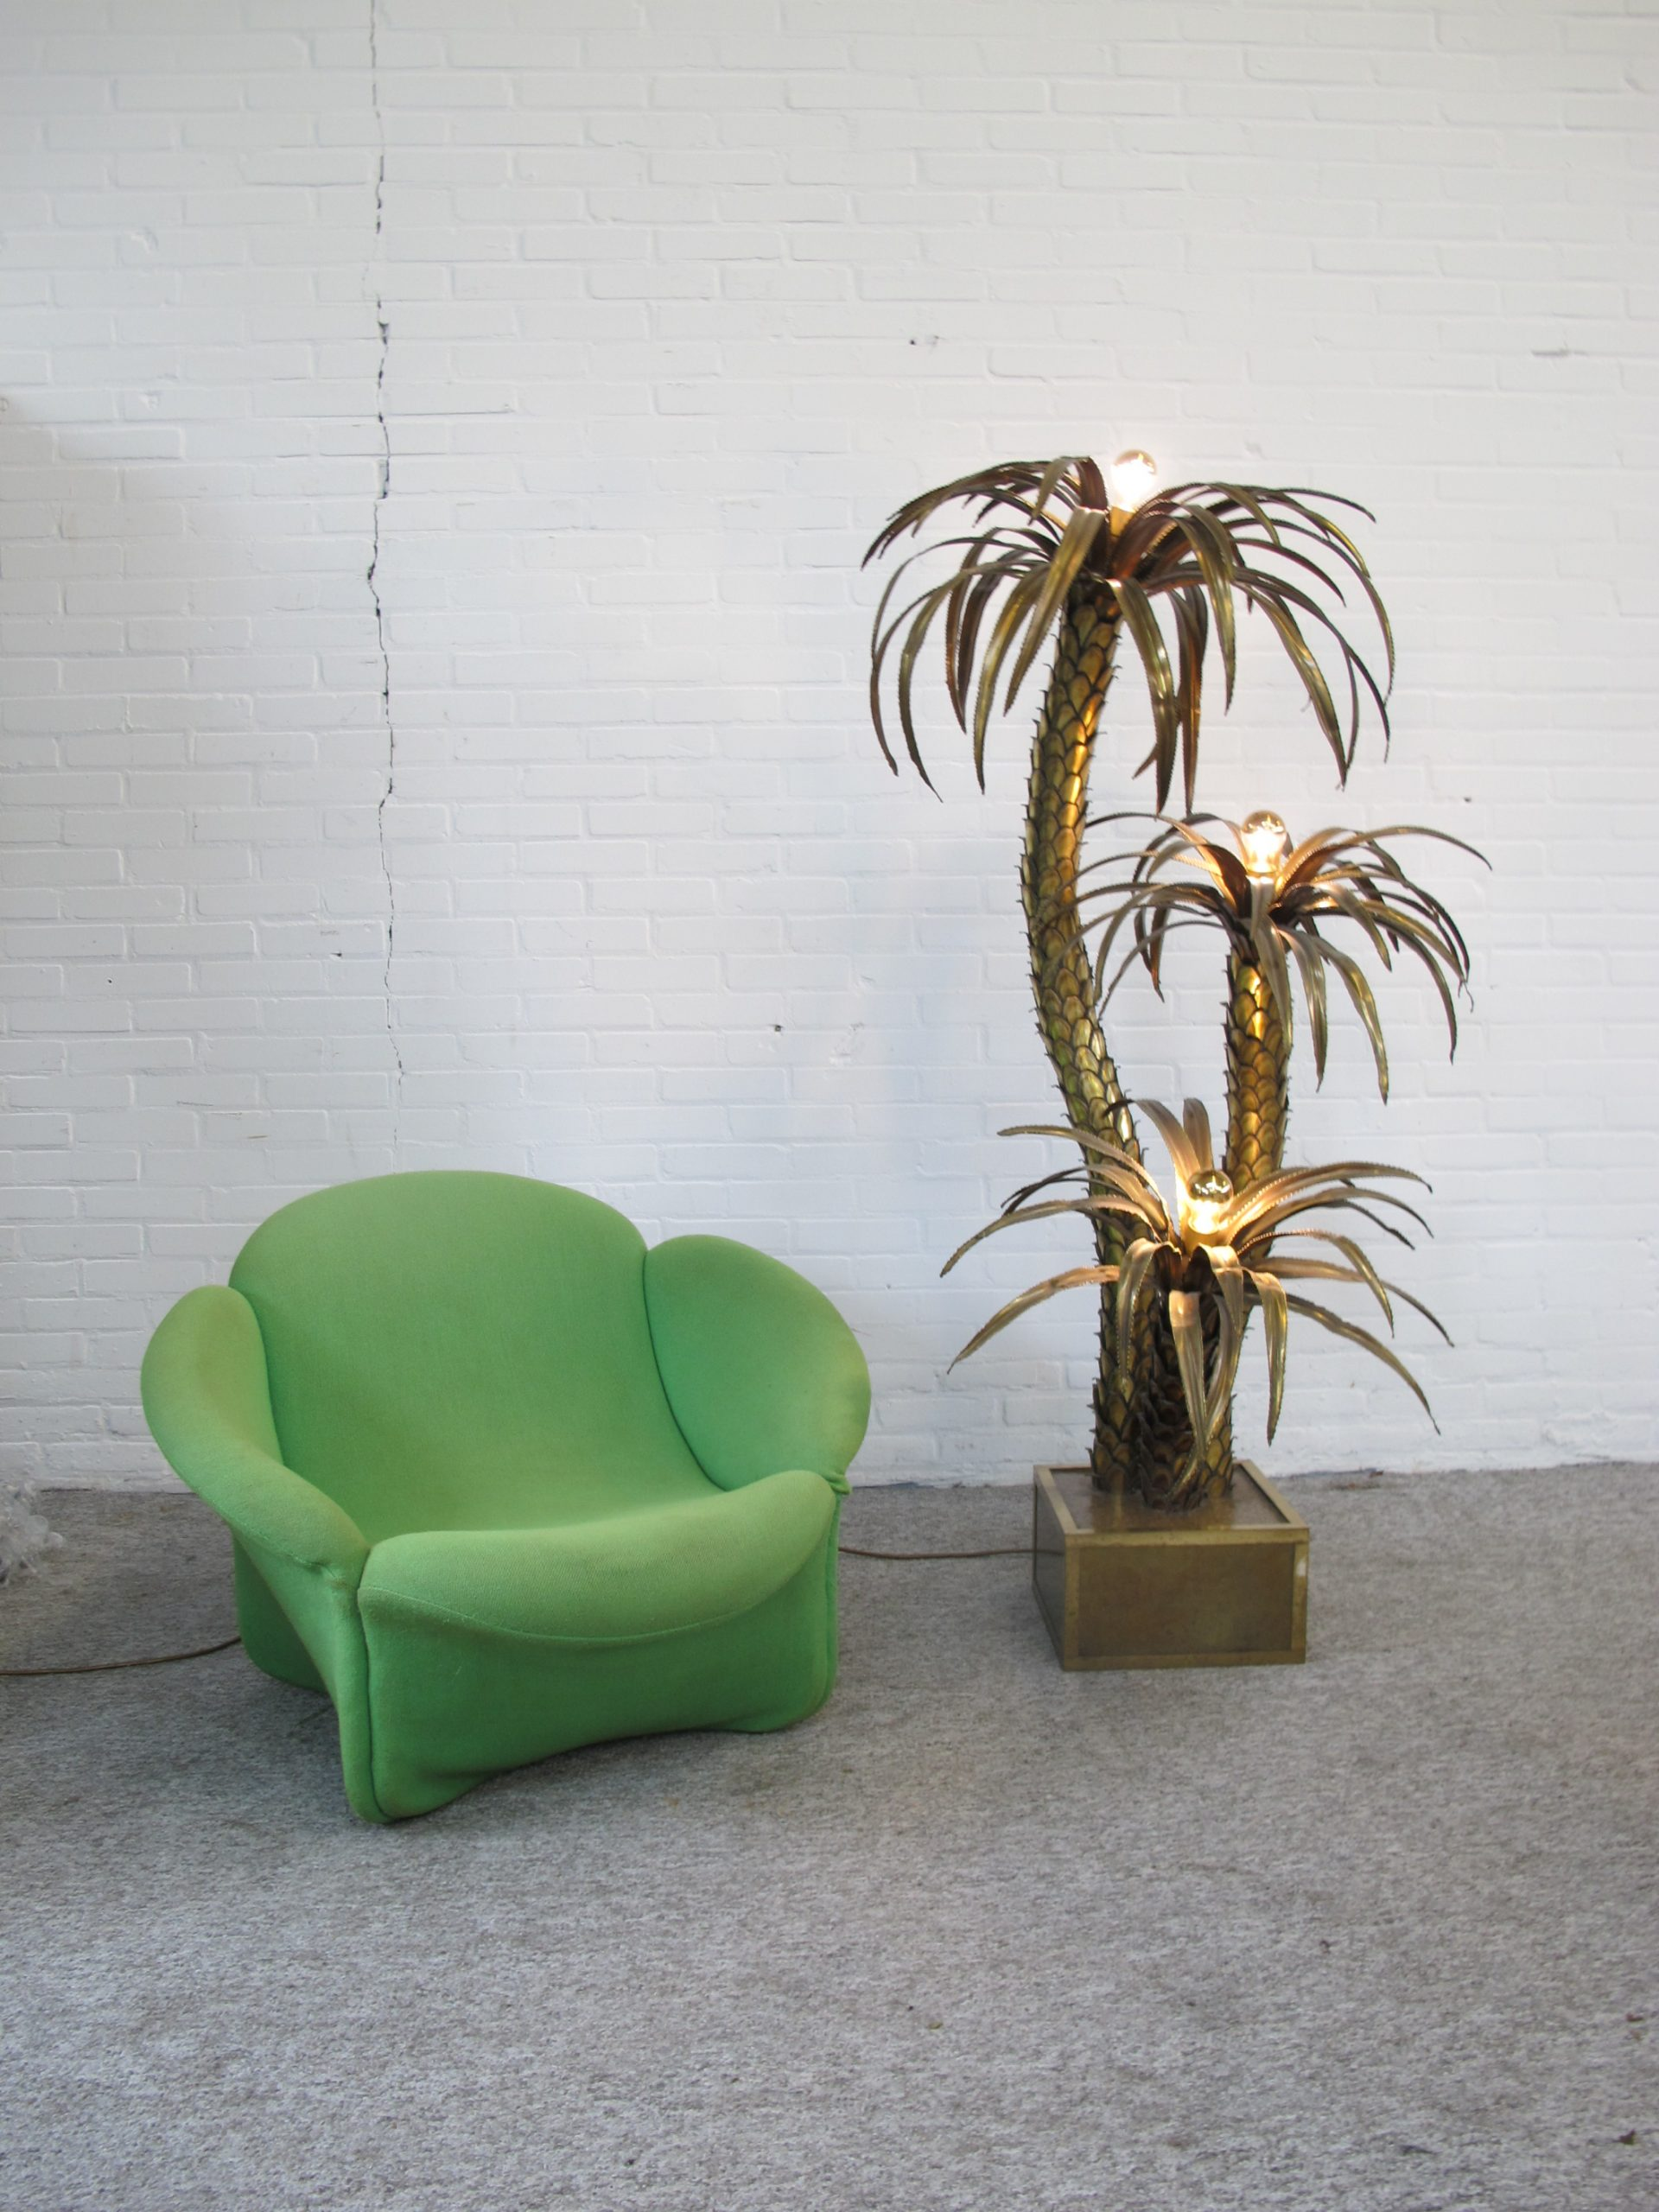 Maison Jansen Palmboom vloerlamp lounge chair fauteuil